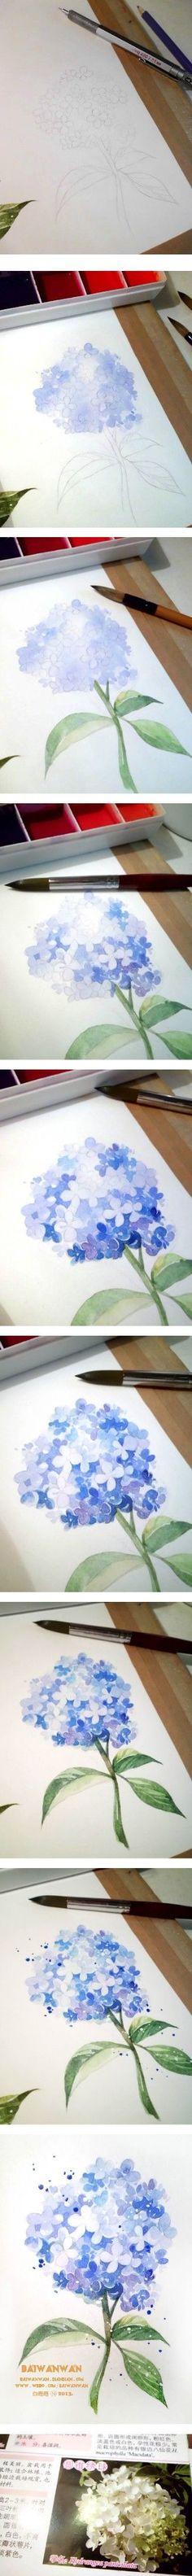 watercolor flowers: